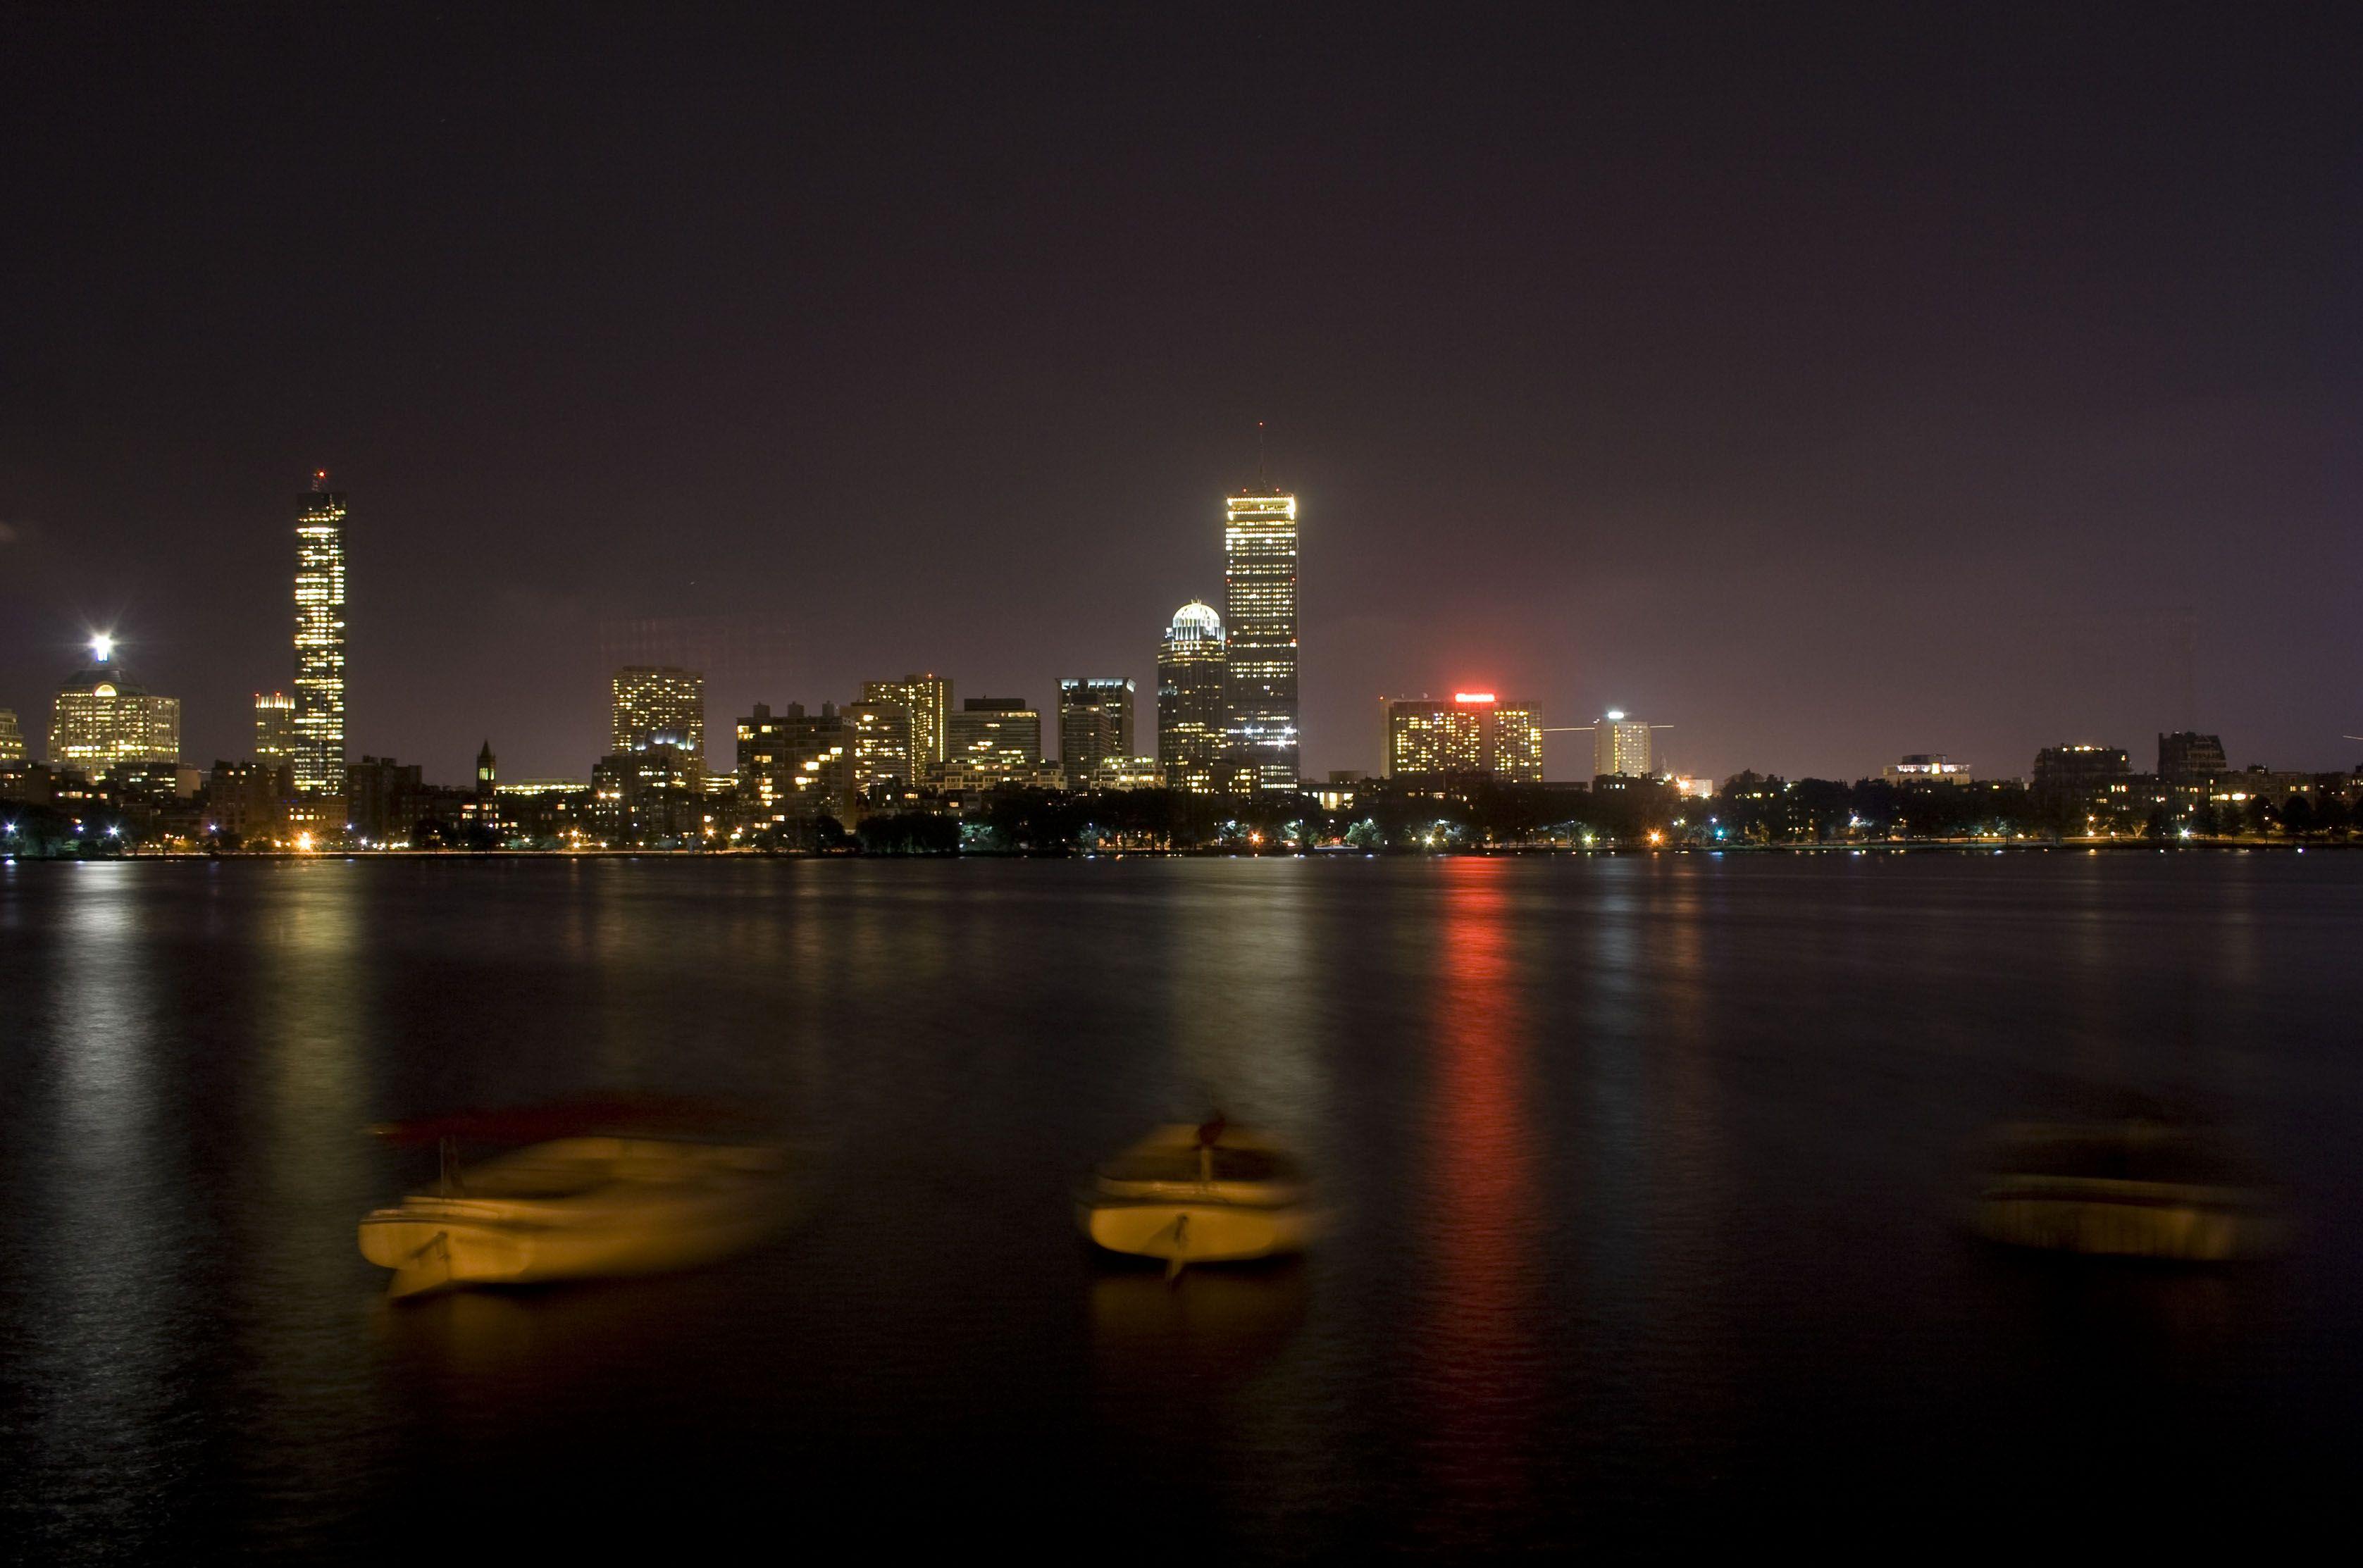 Night View Hd Wallpaper File Boston At Night Sdfkb Jpg Wikimedia Commons